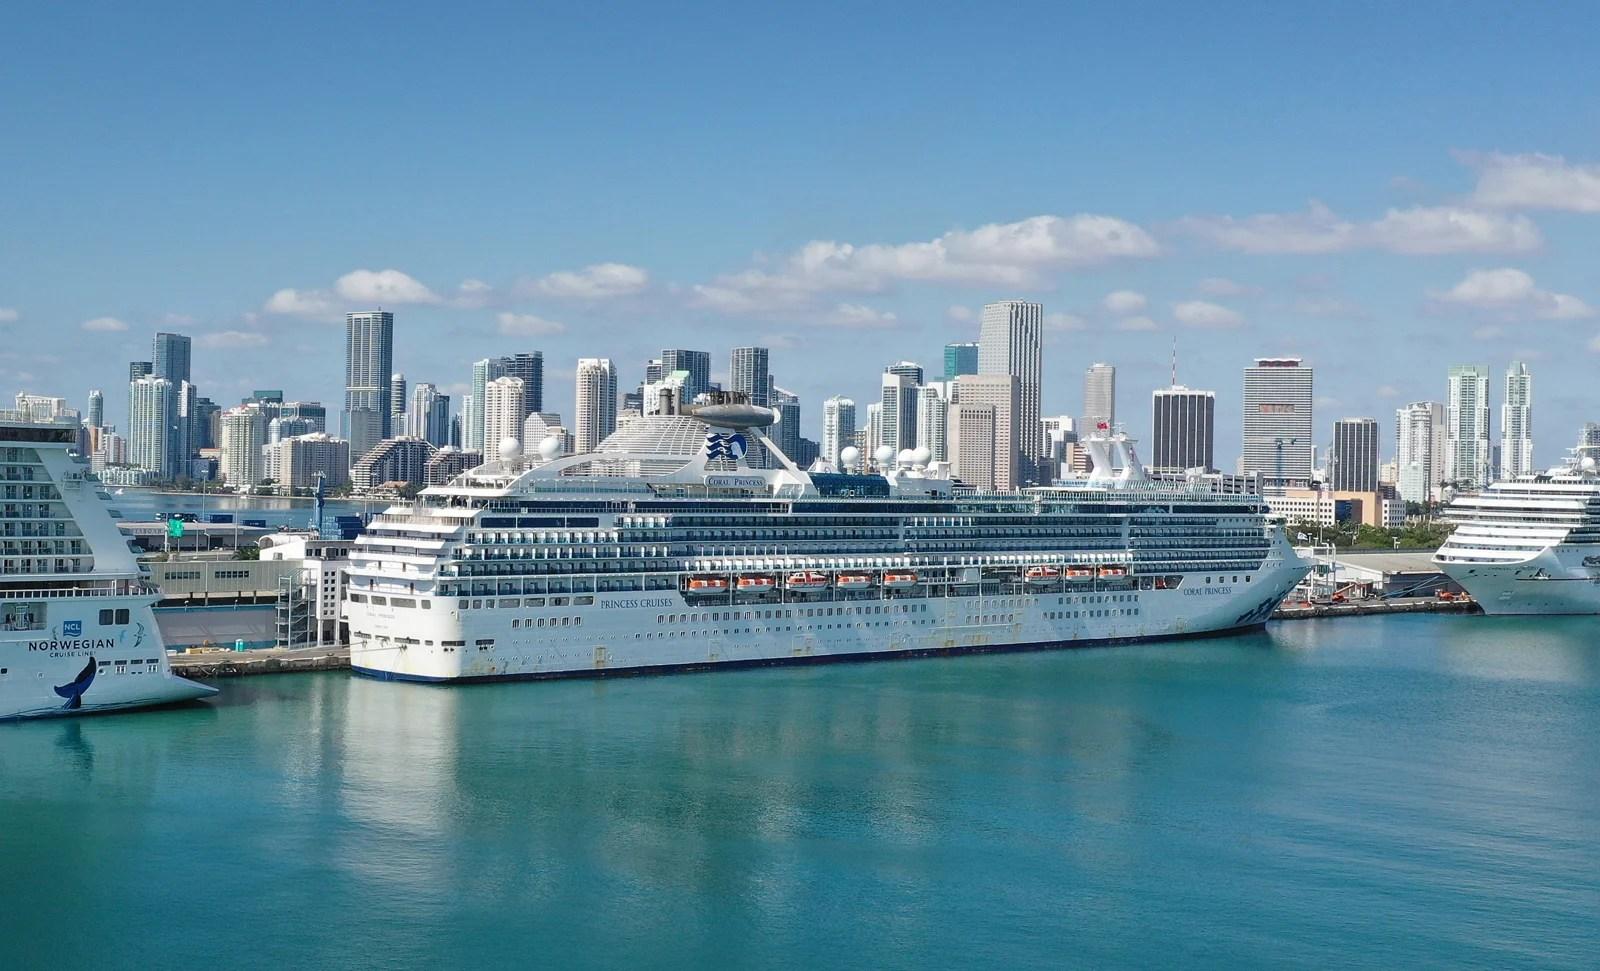 Death toll rises as Princess Cruises tries to get passengers off coronavirus-stricken ship